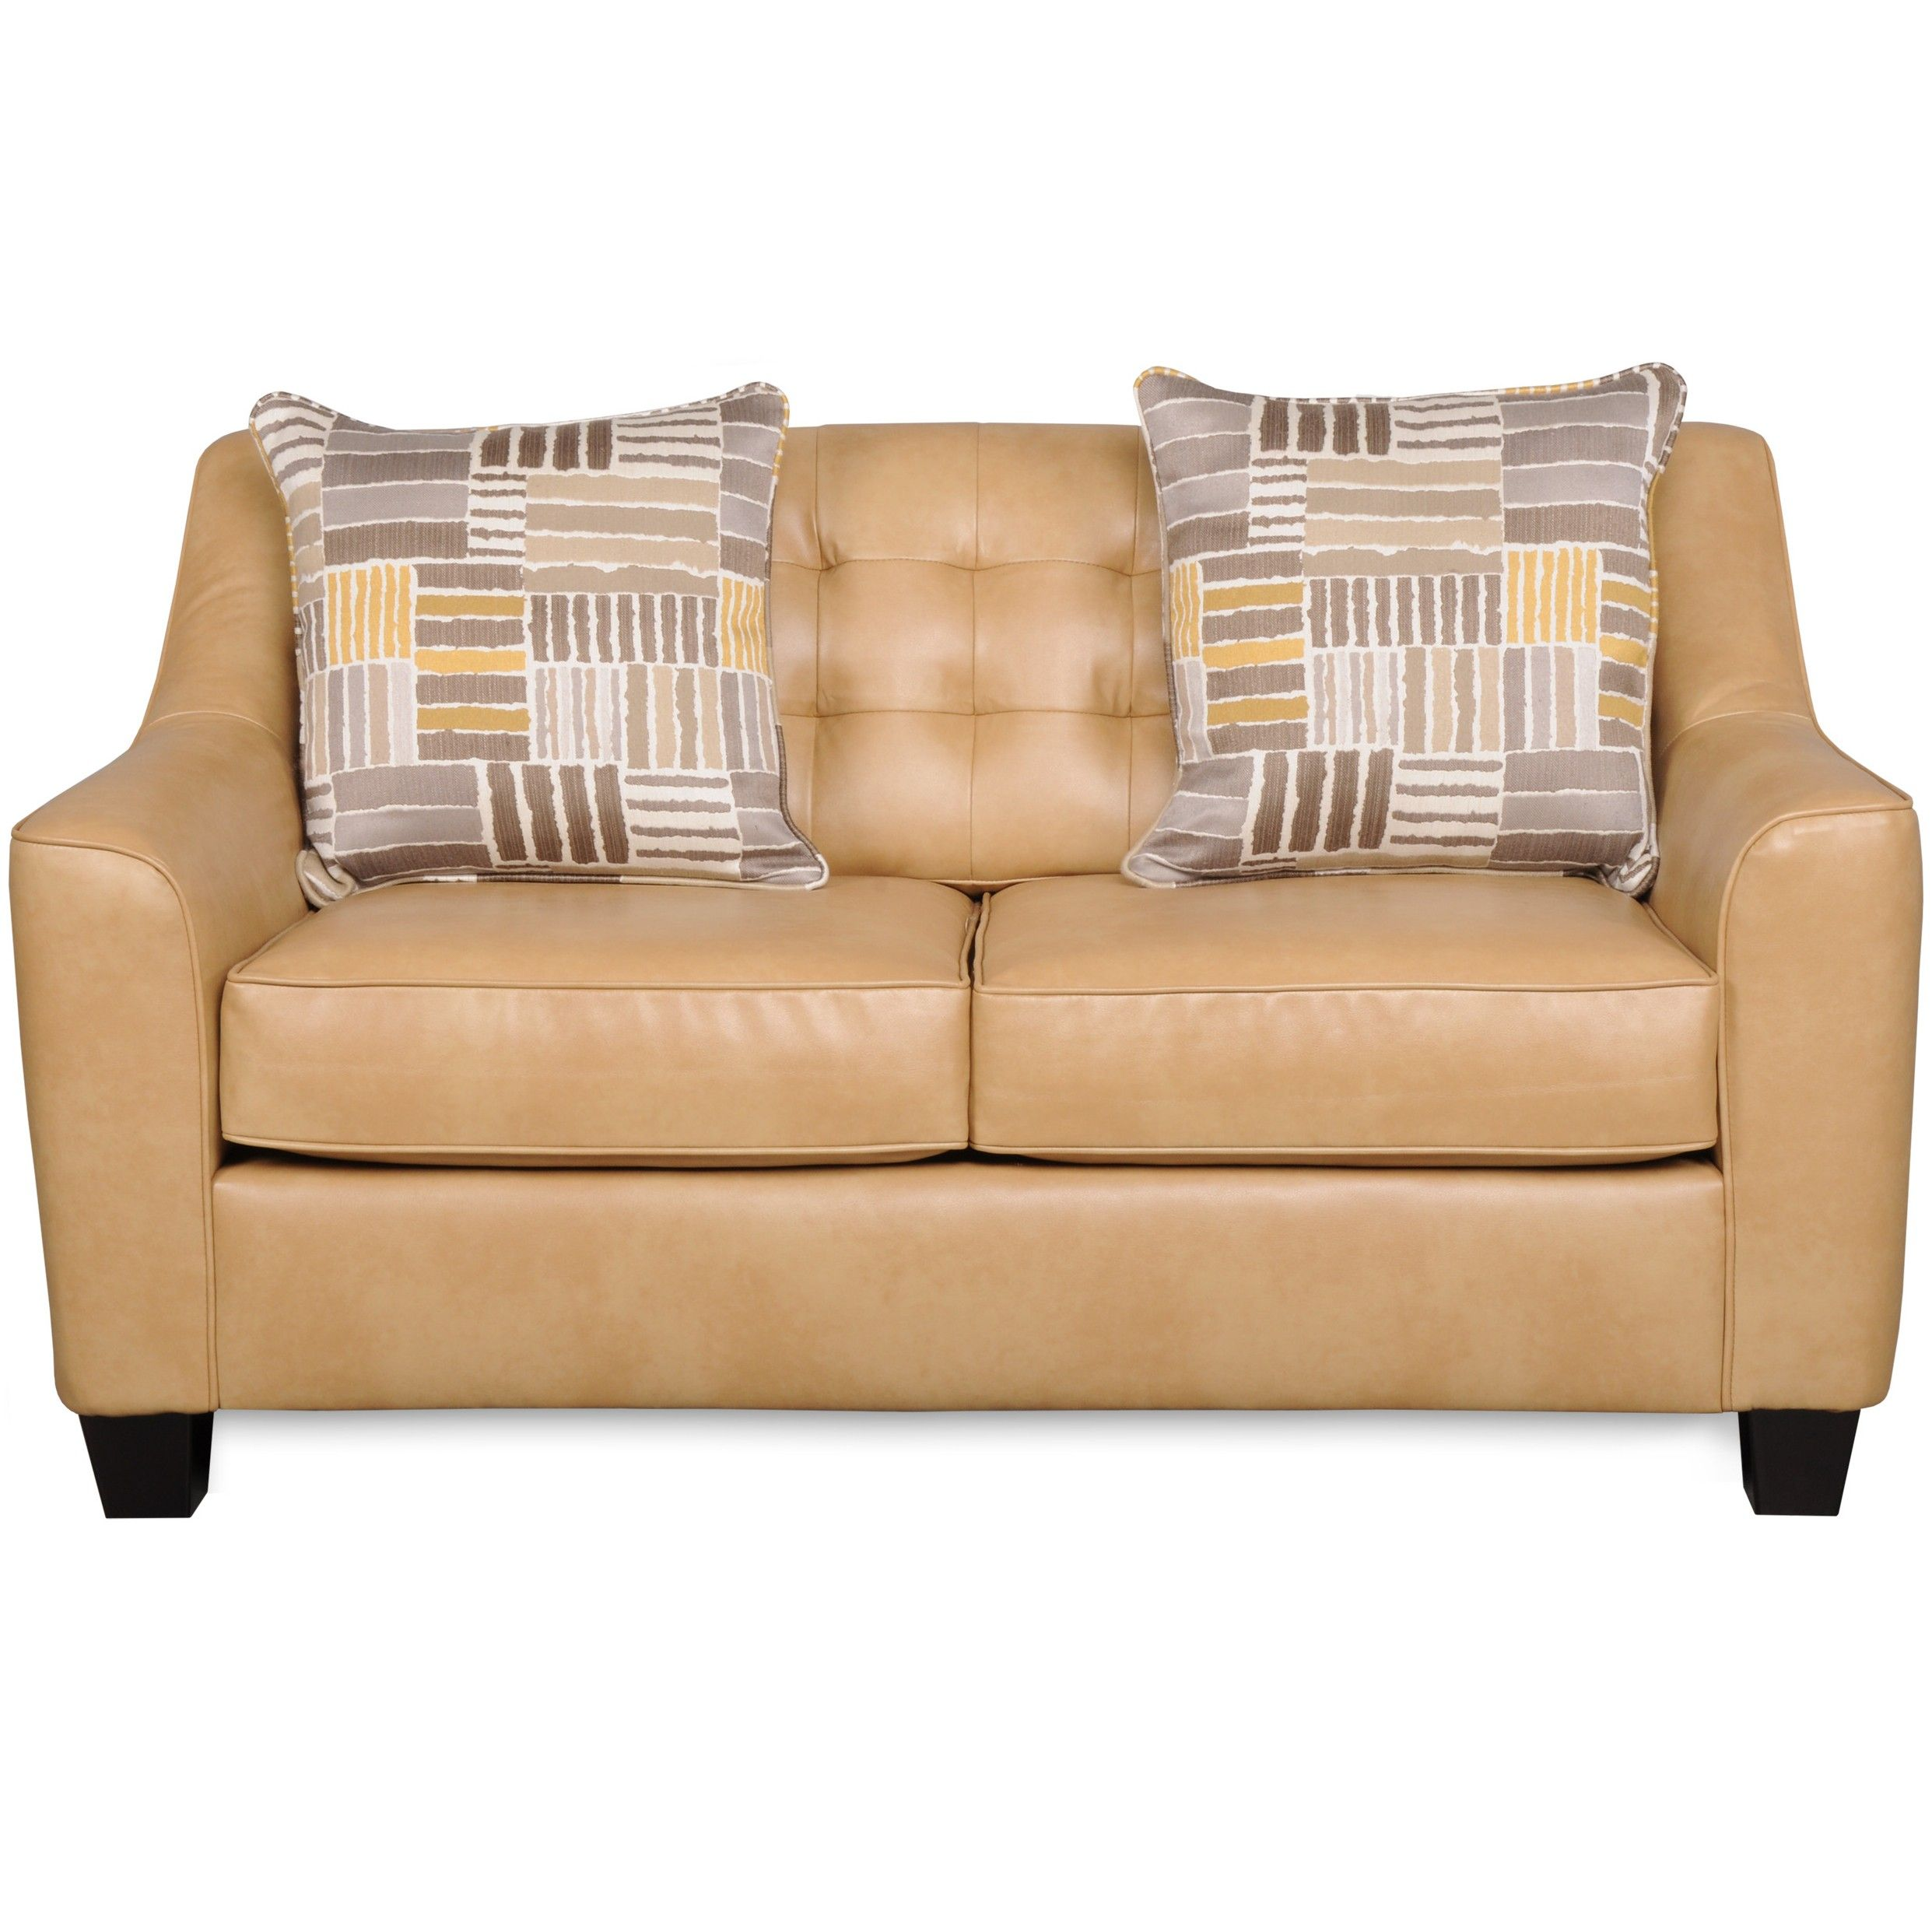 Living Room Furniture Modern Light Brown Leather Love Seat ...